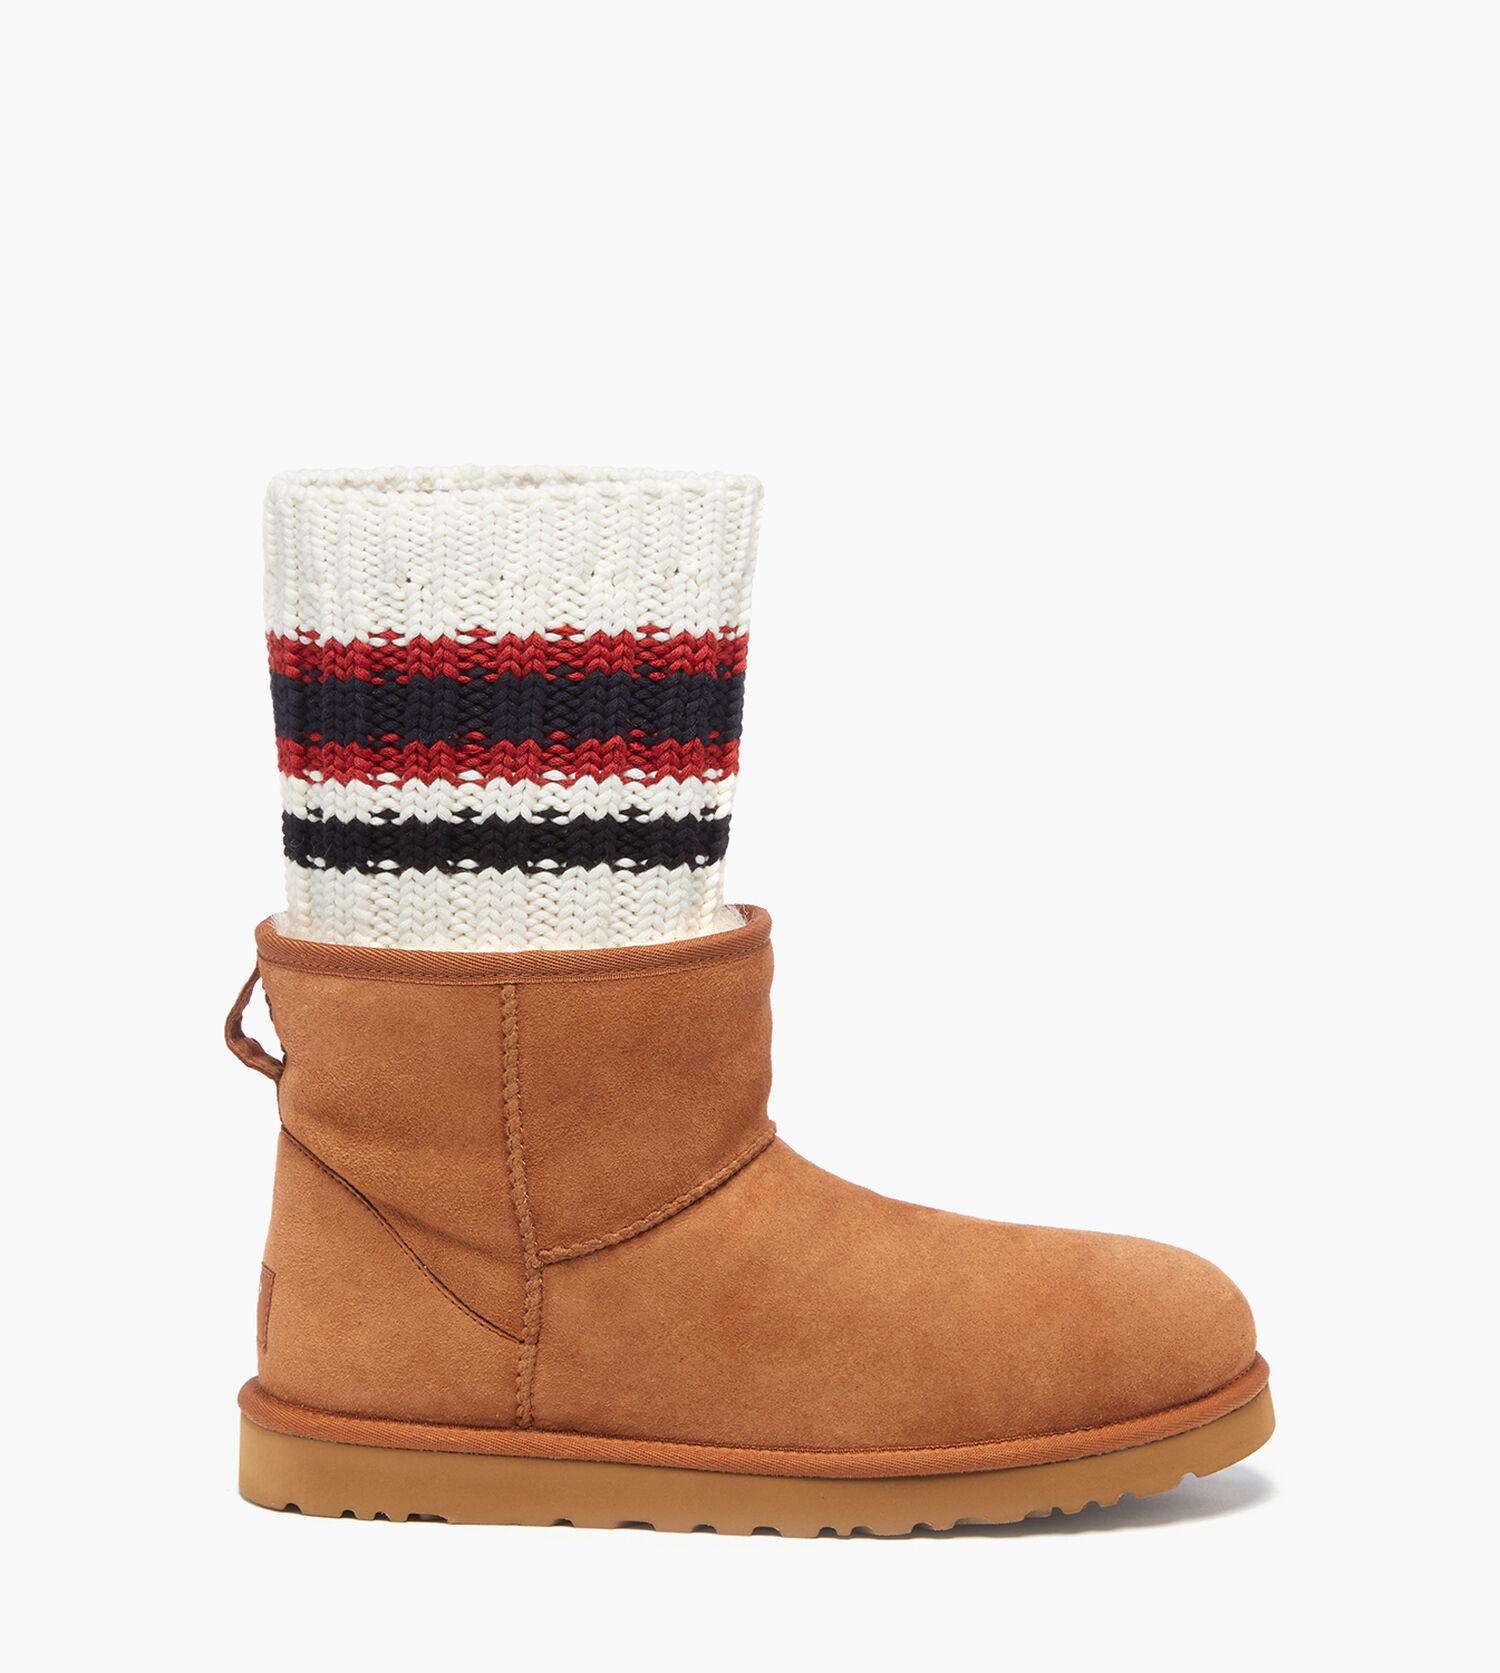 fc3f8986108 Men's Share this product Sacai Knit Classic Mini Ii